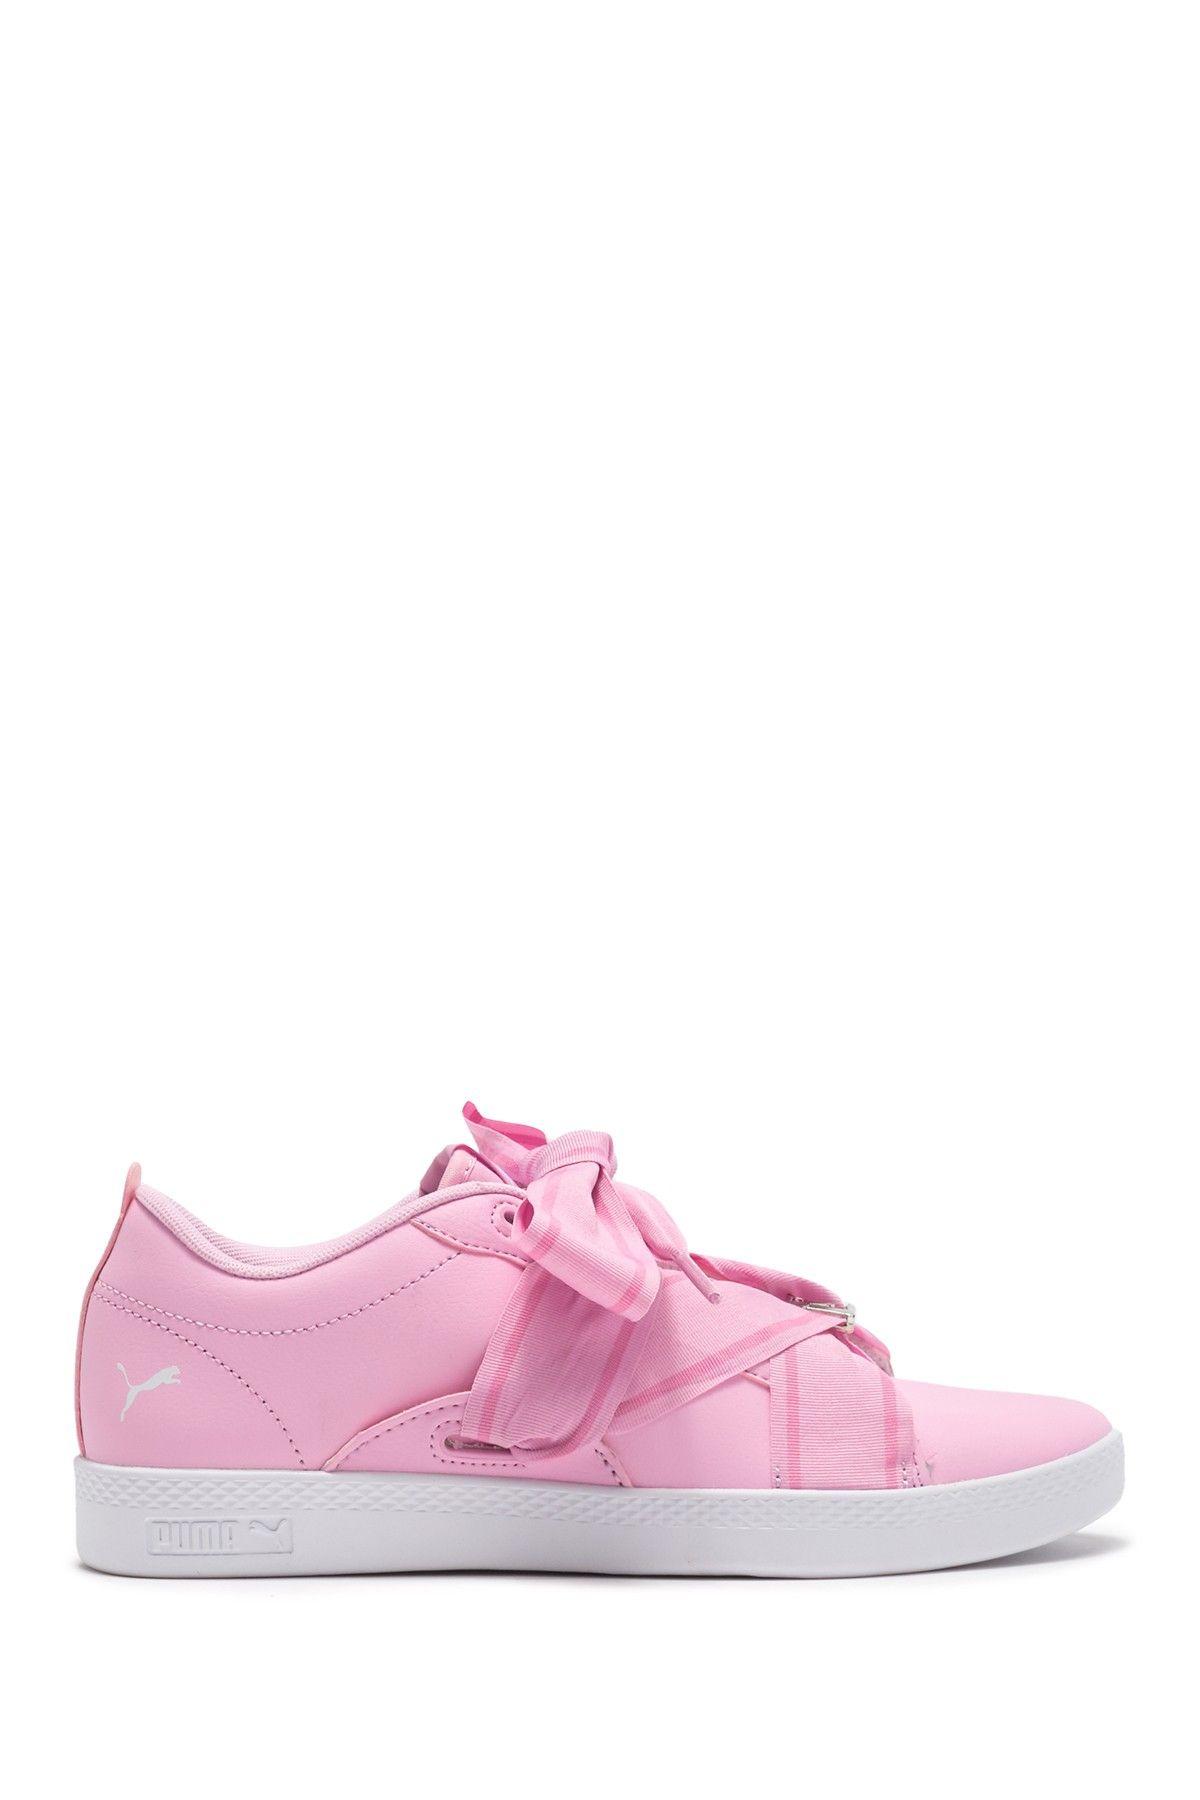 huge discount 22096 18796 PUMA | Smash Ribbon & Buckle Sneaker in 2019 | Nordstrom ...